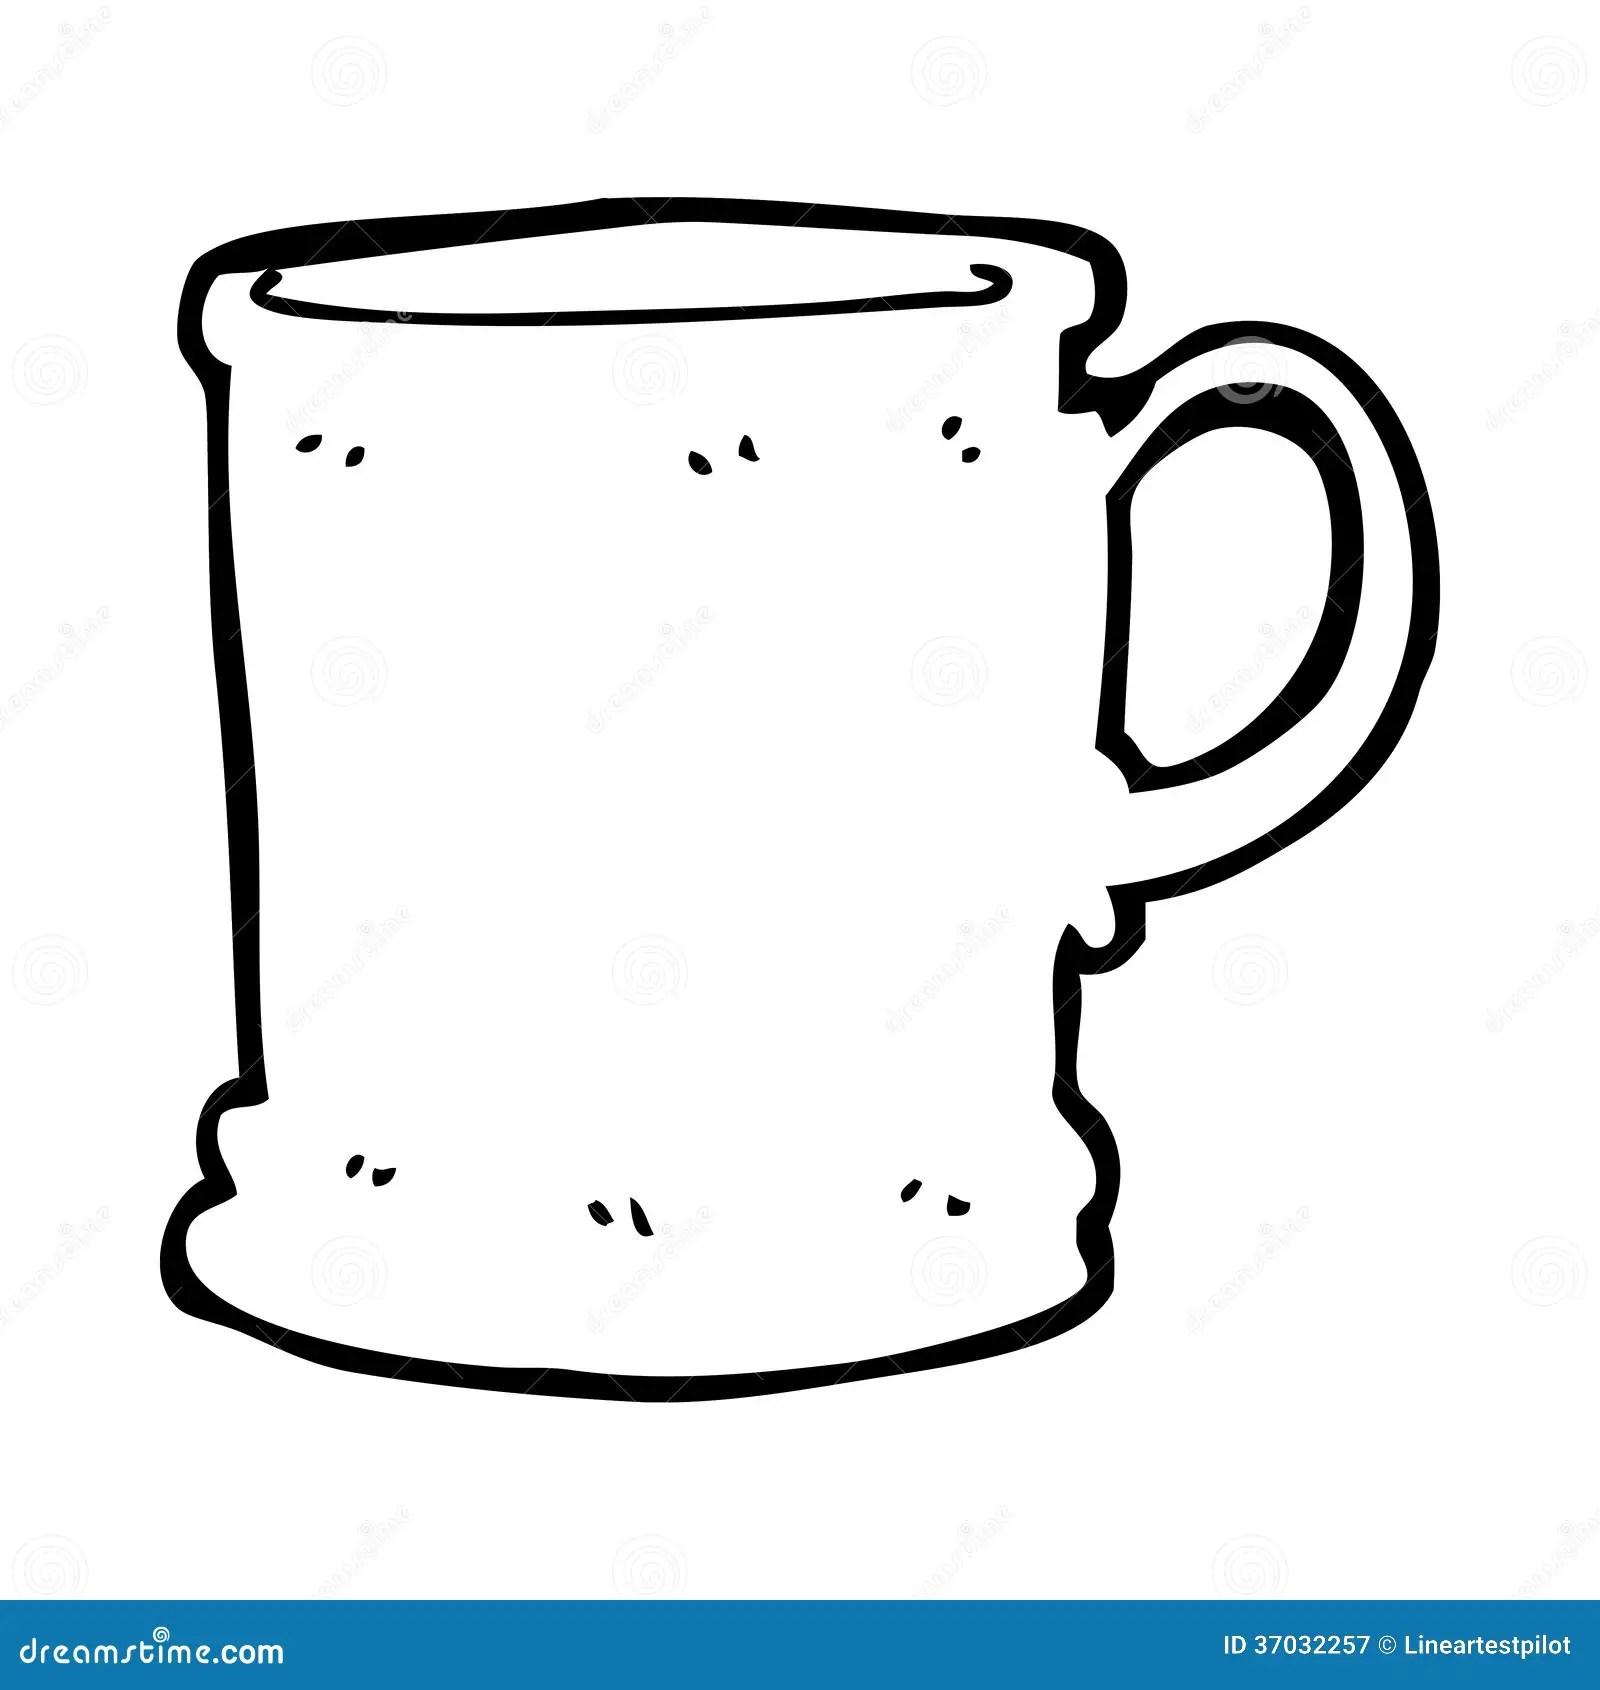 Cartoon Mug Royalty Free Stock Photography